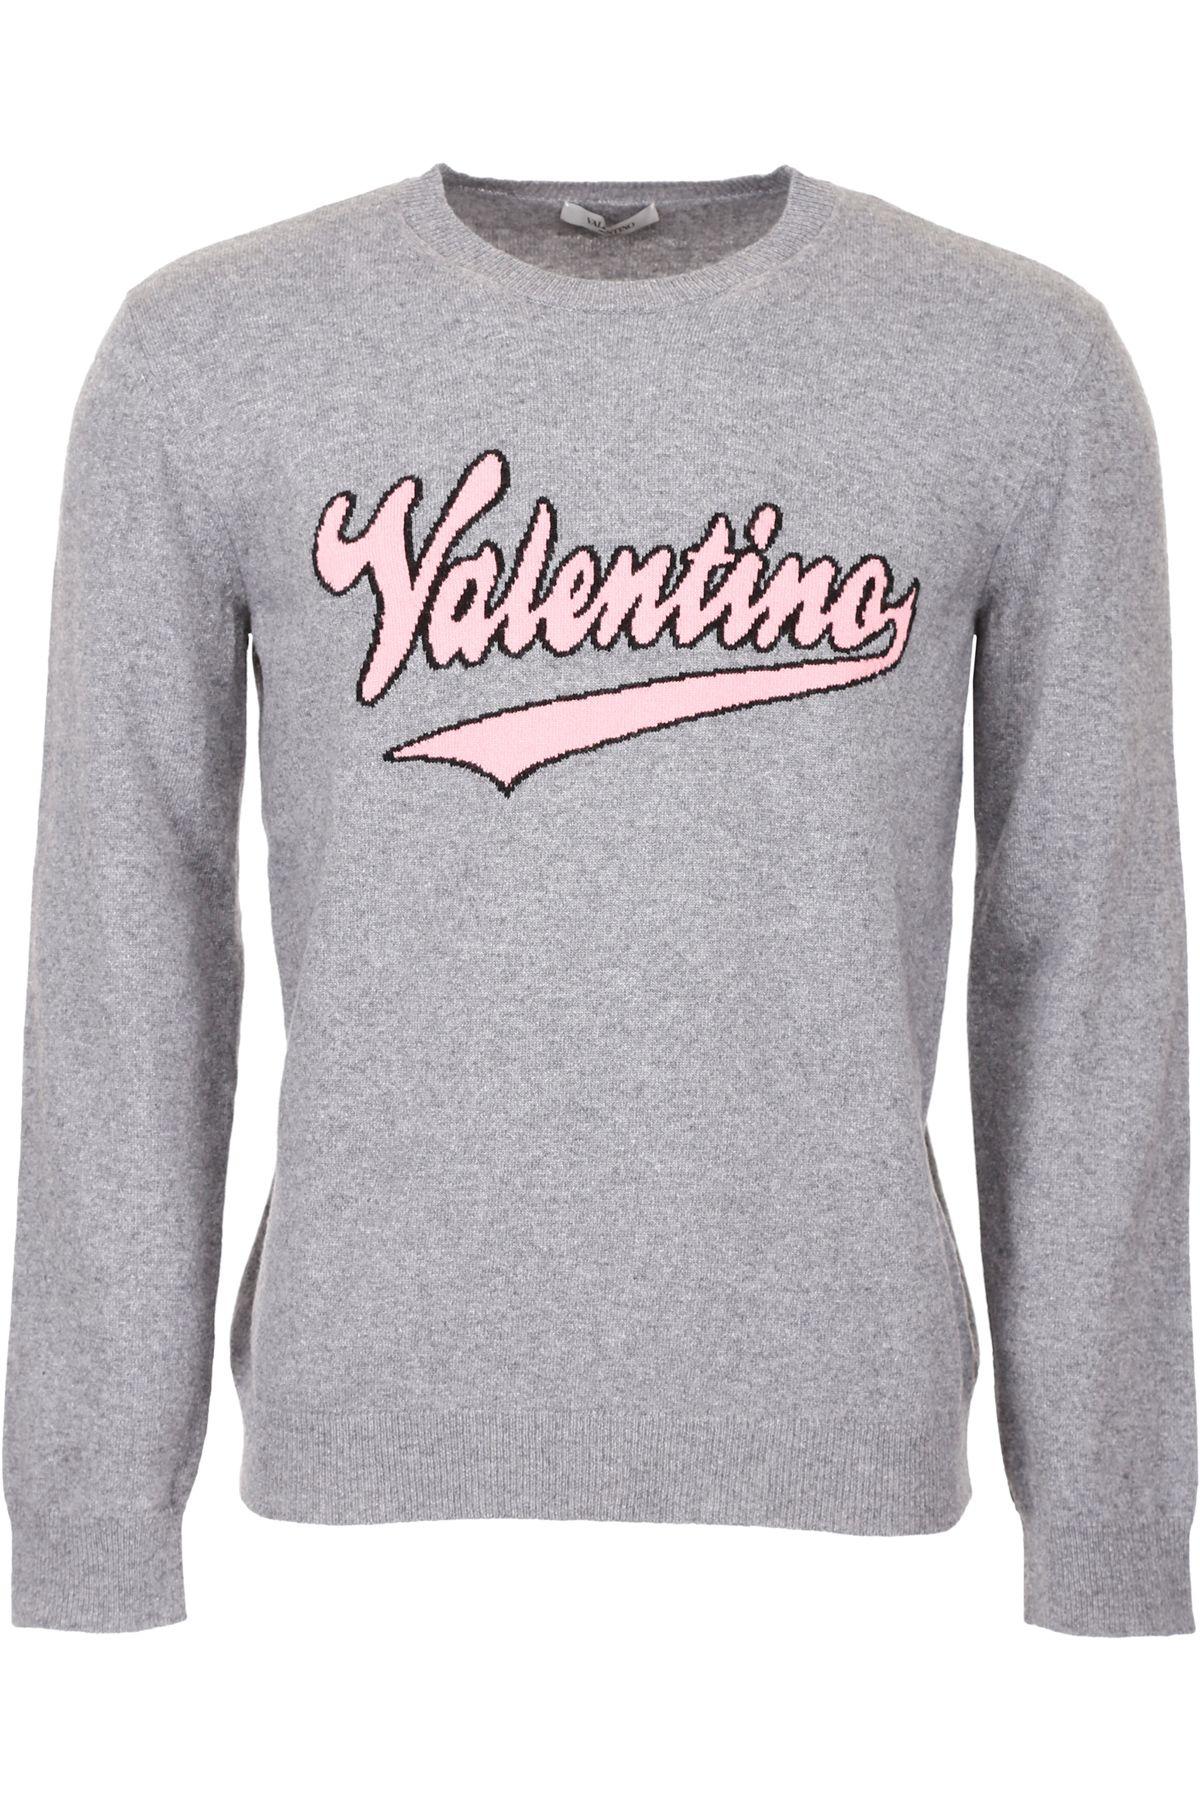 Valentino Logo Pullover